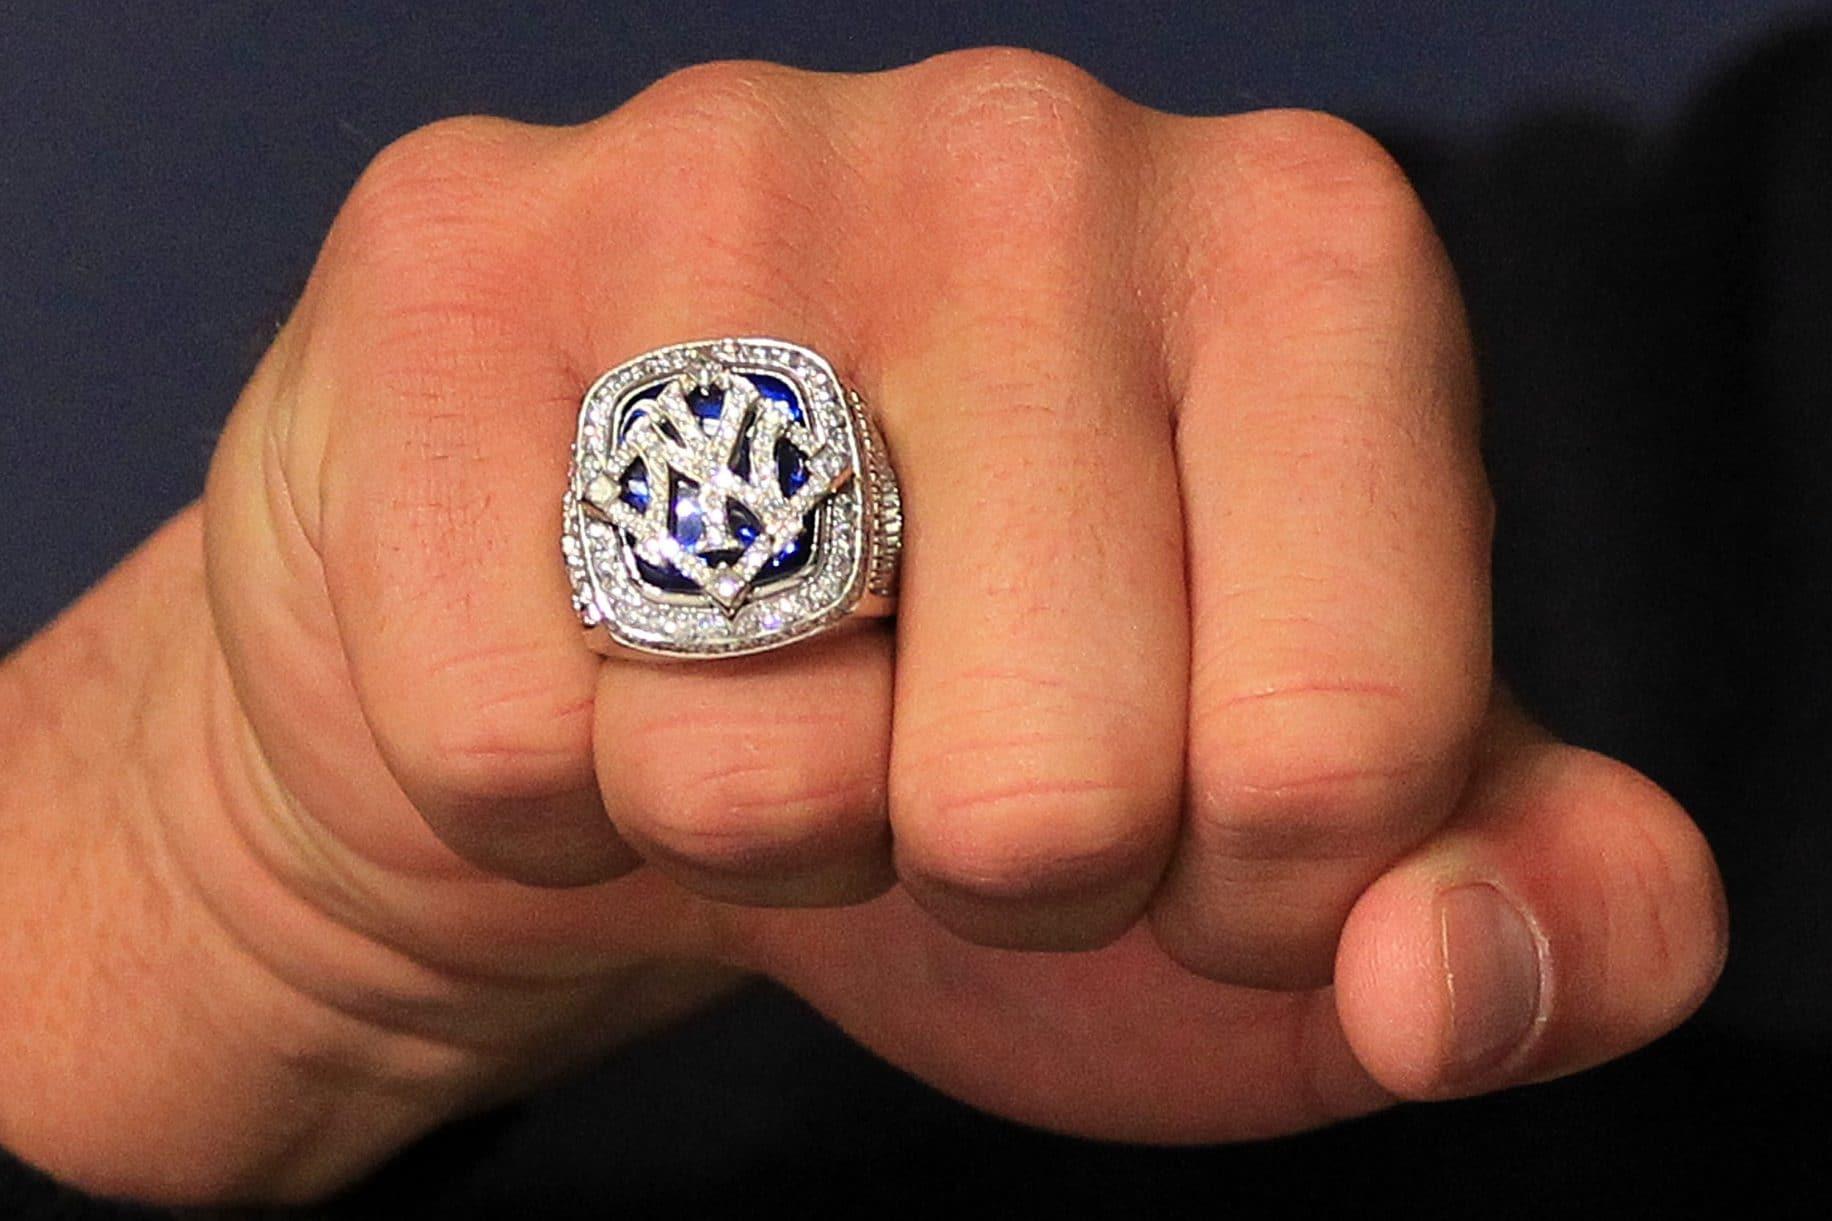 New York Yankees Championship Ring